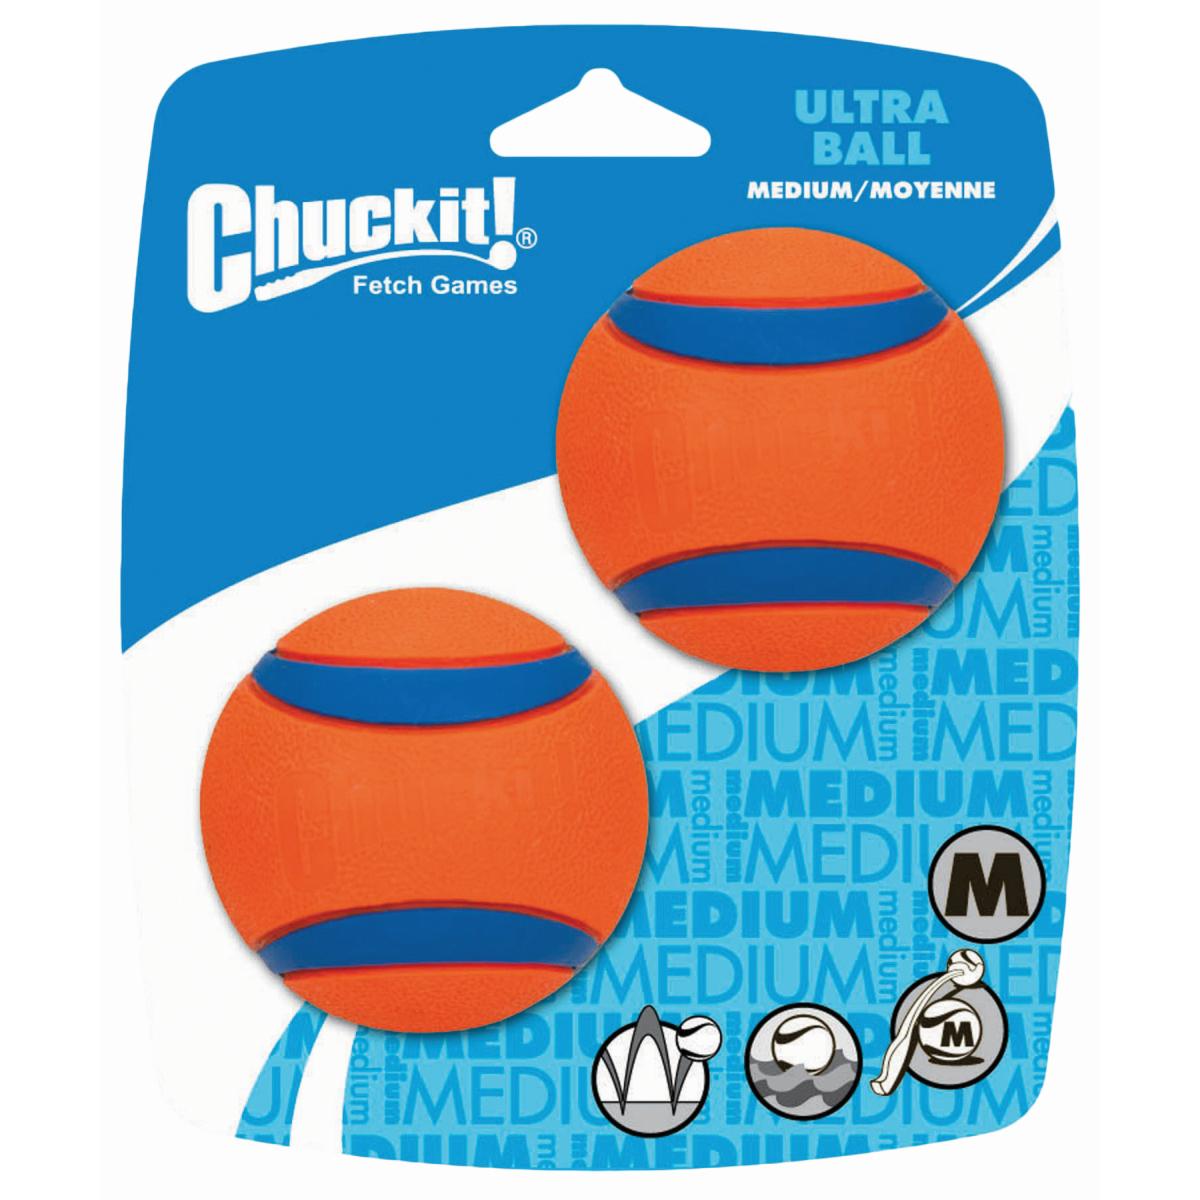 Ultra ball 2 pack